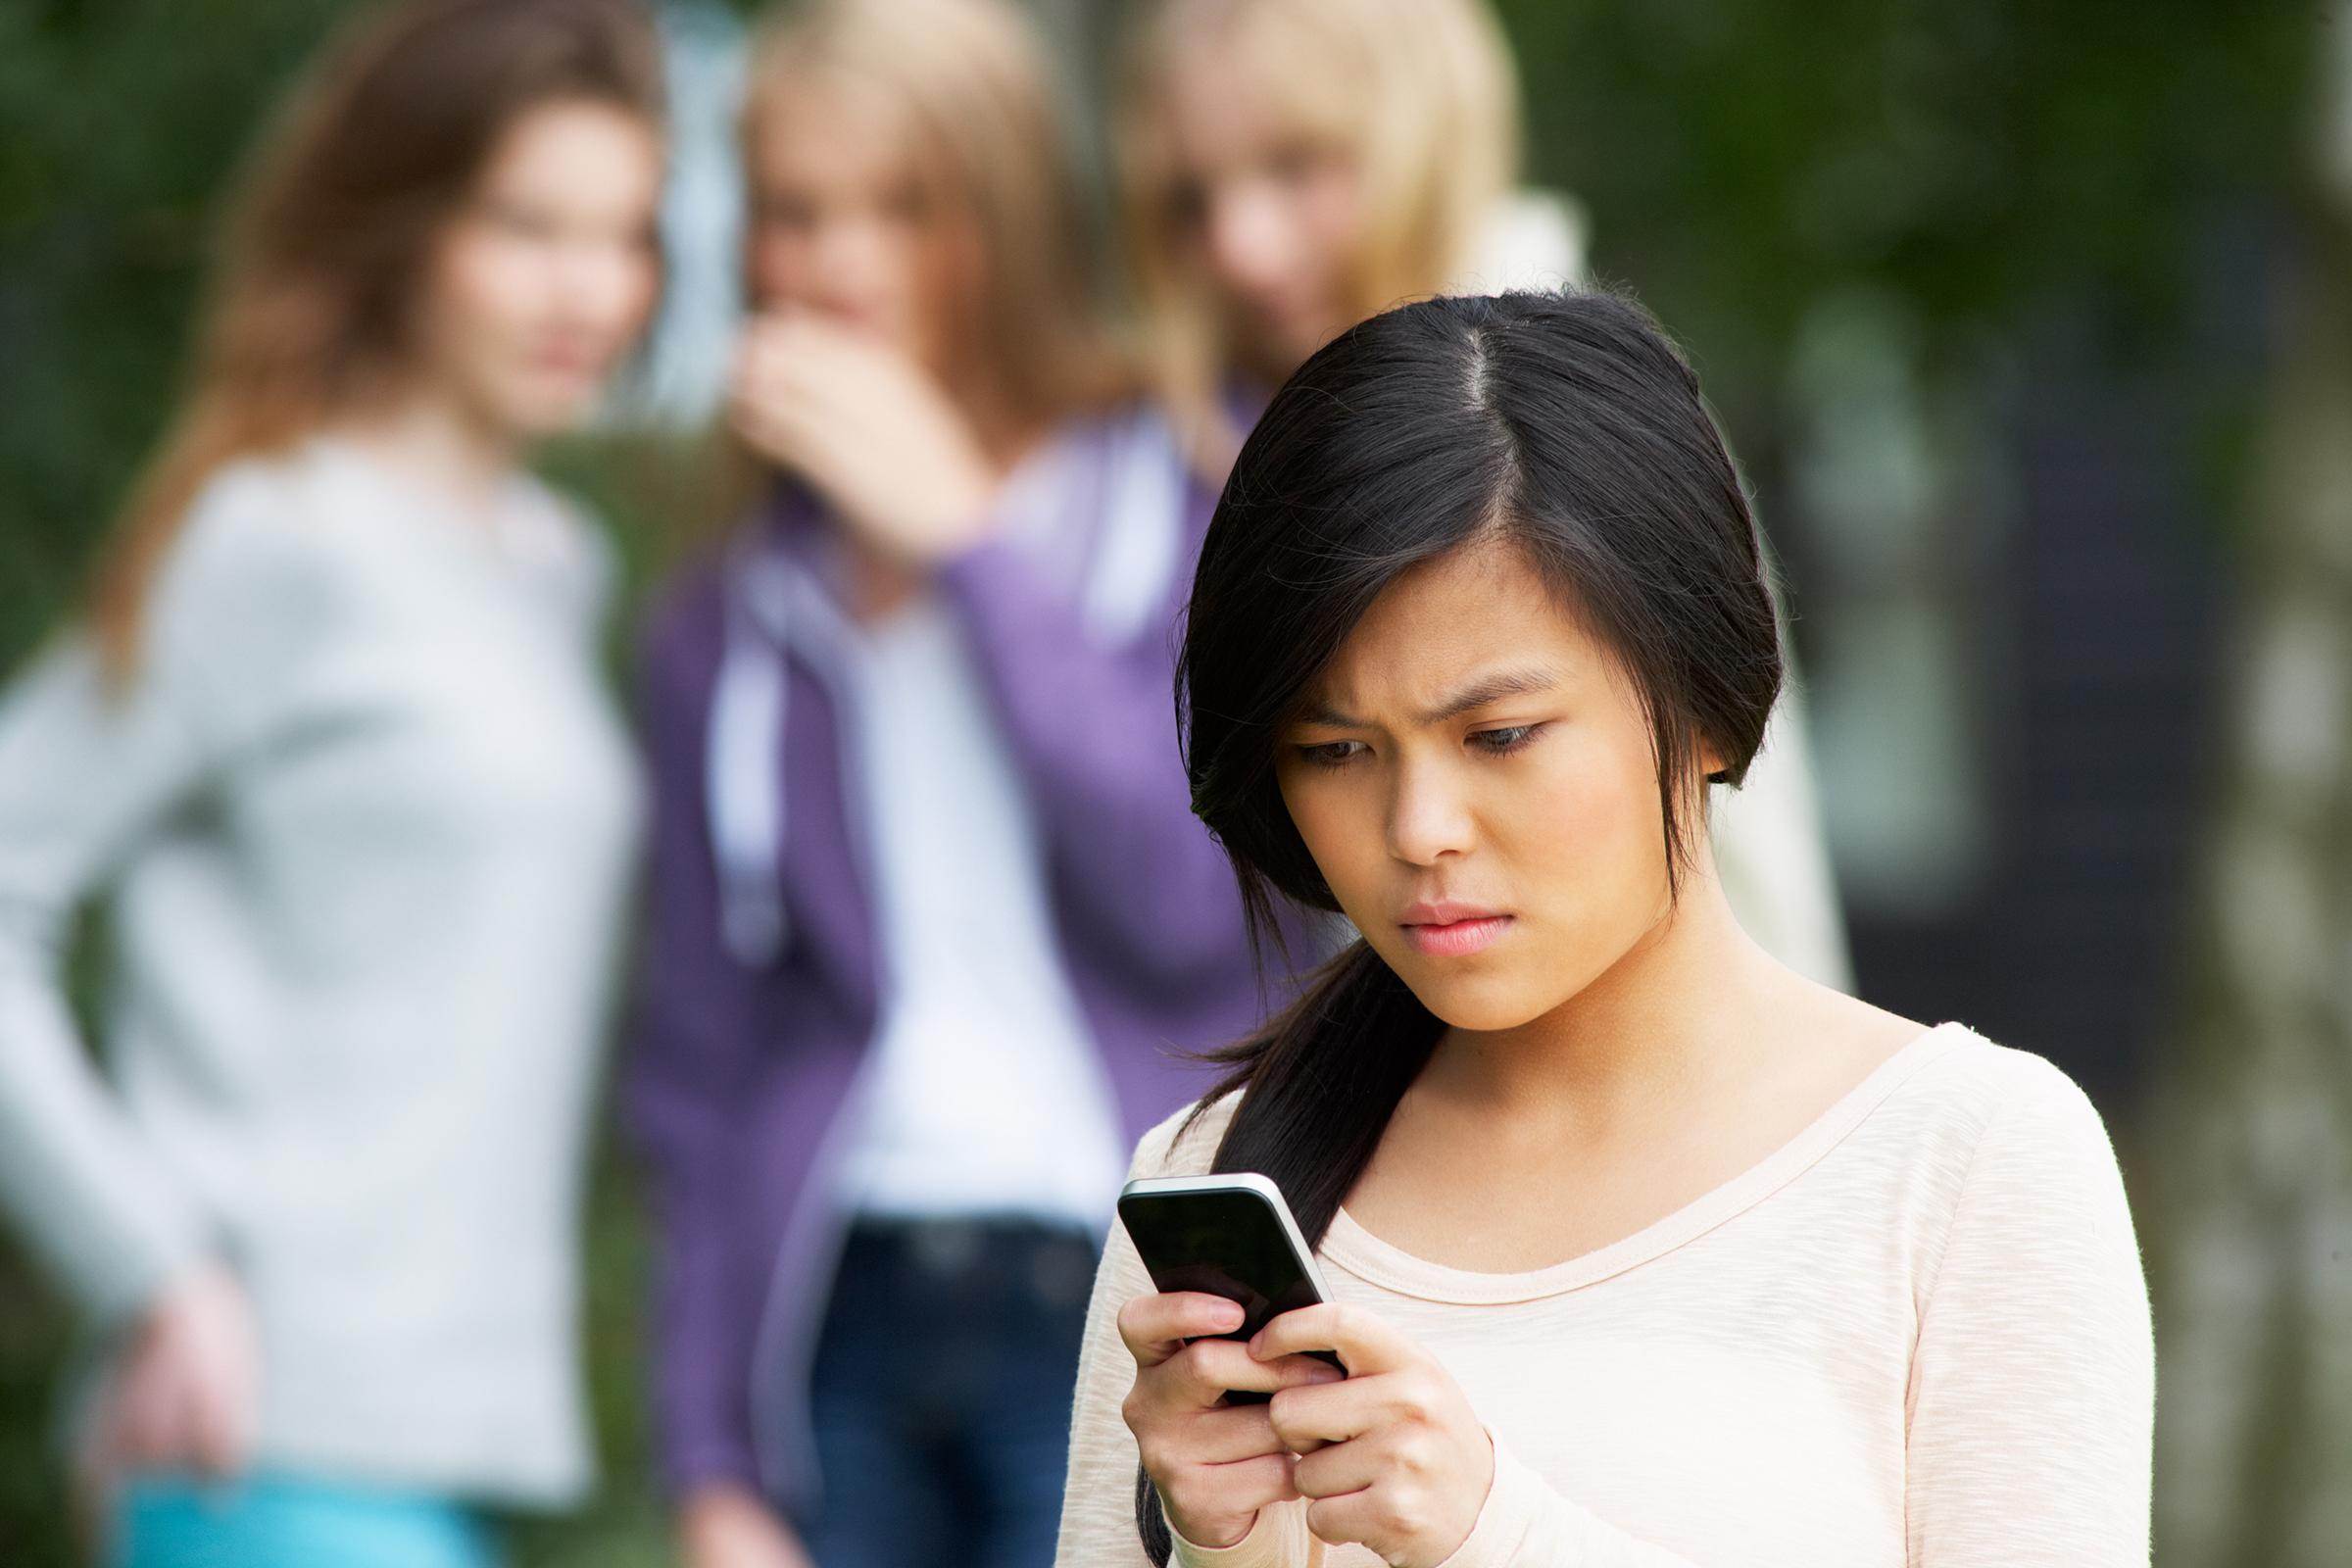 Stop the Bullying (Anti-bullying)